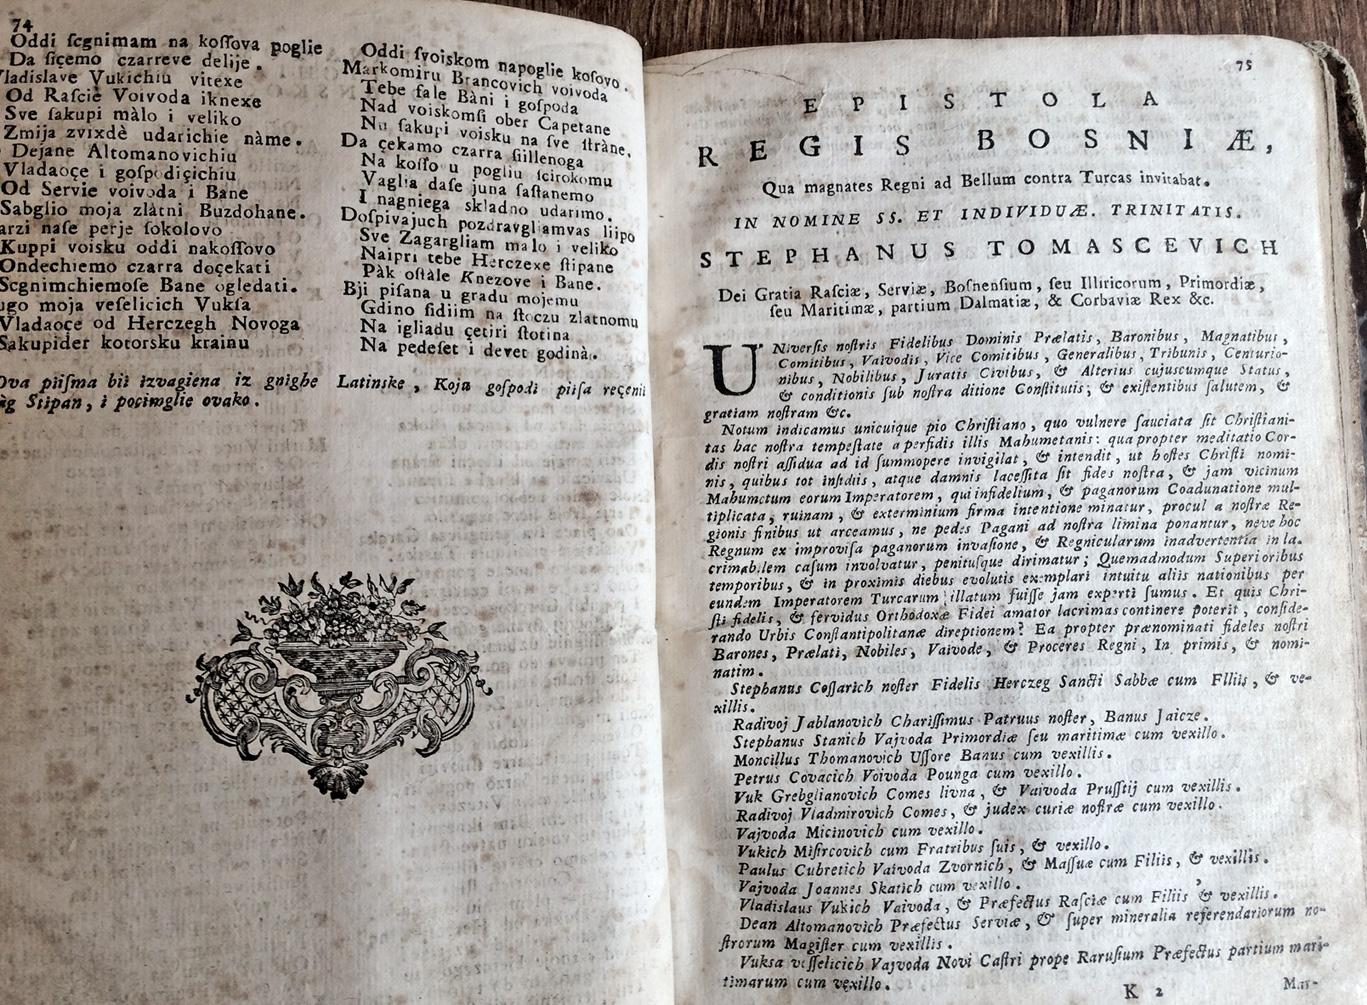 Epistola Regis Bosniae. Detalj iz knjige : Razgovor ugodni naroda slovinskoga - Andrija Kacic Miosic 1759